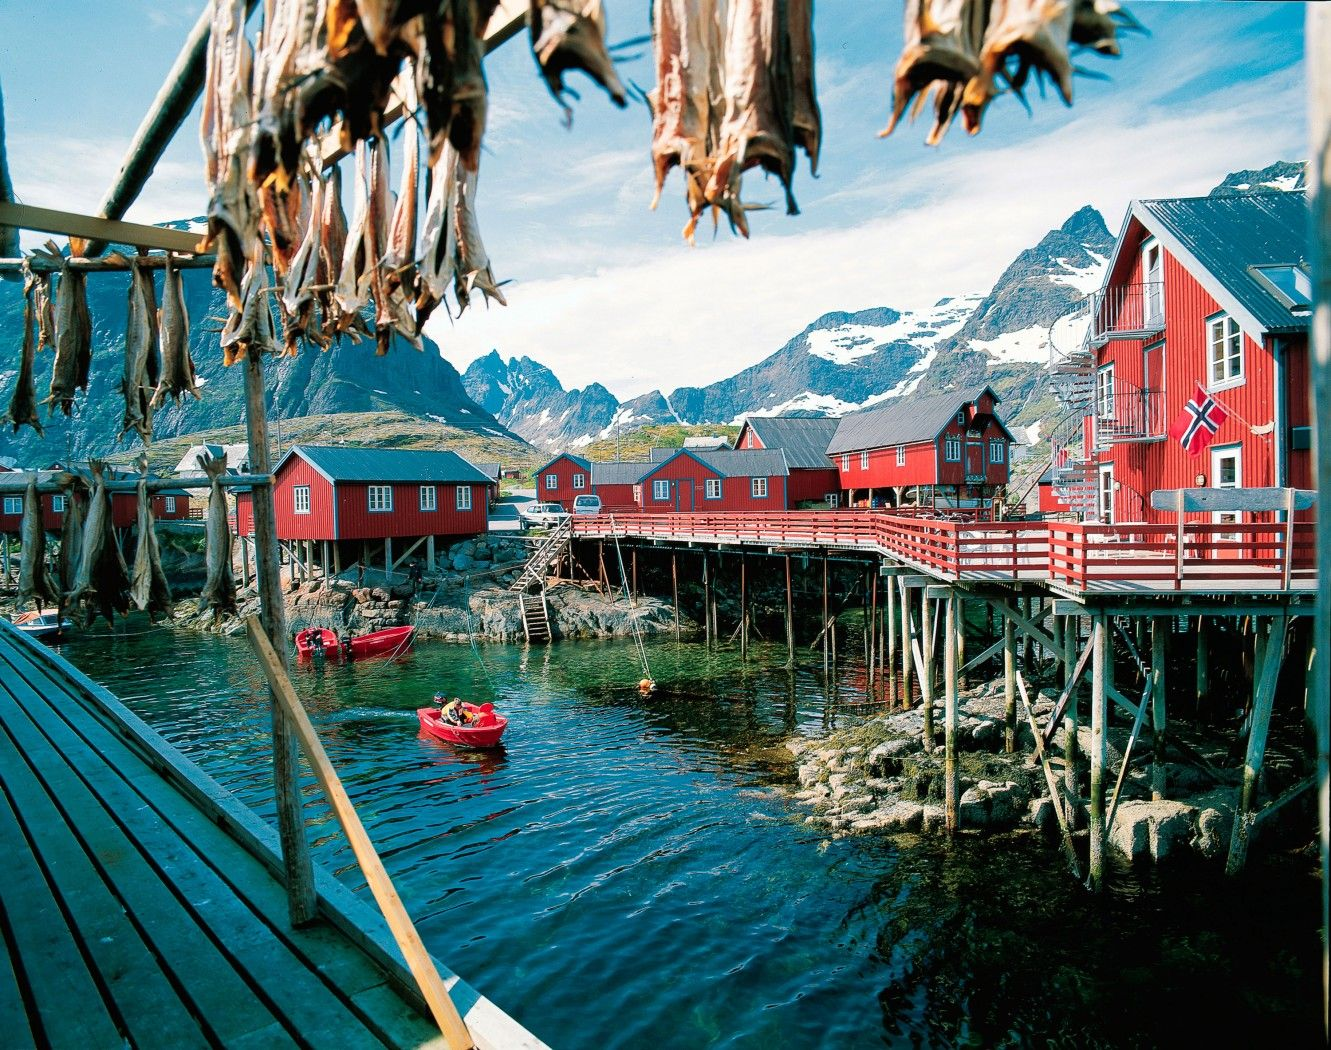 Must see places in Norway | Lofoten, Norway travel, Visit norway